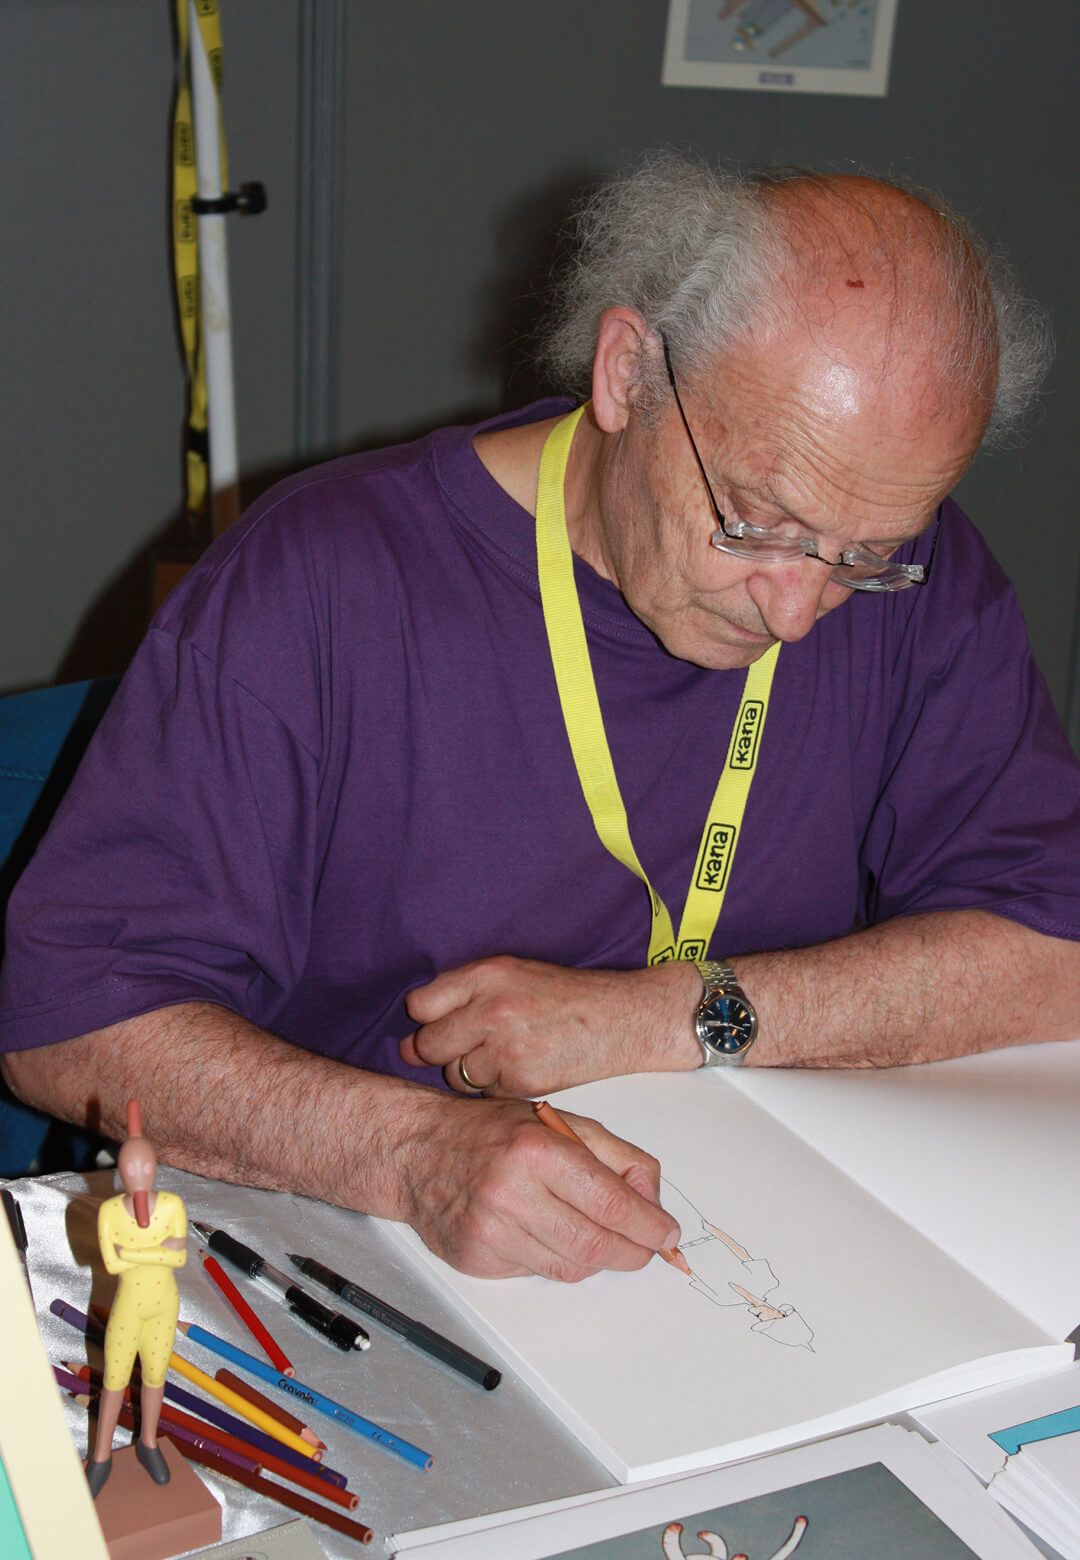 L: Mœbius signing autographs at the Japan Expo in Paris in 2008. R: Levitation (2005) by Mœbius | Levitation | Mœbius | STIRworld